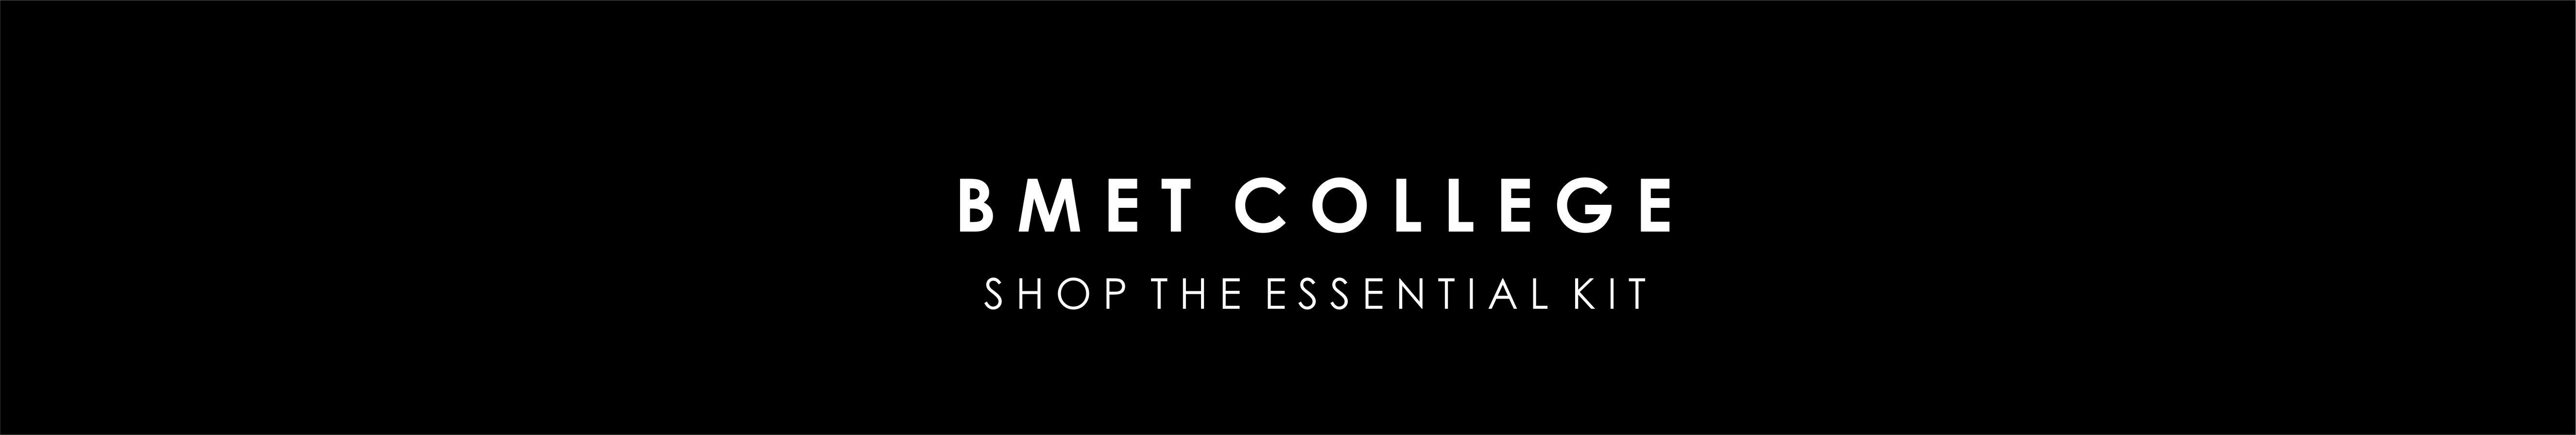 bmet-college-front-banner.jpg